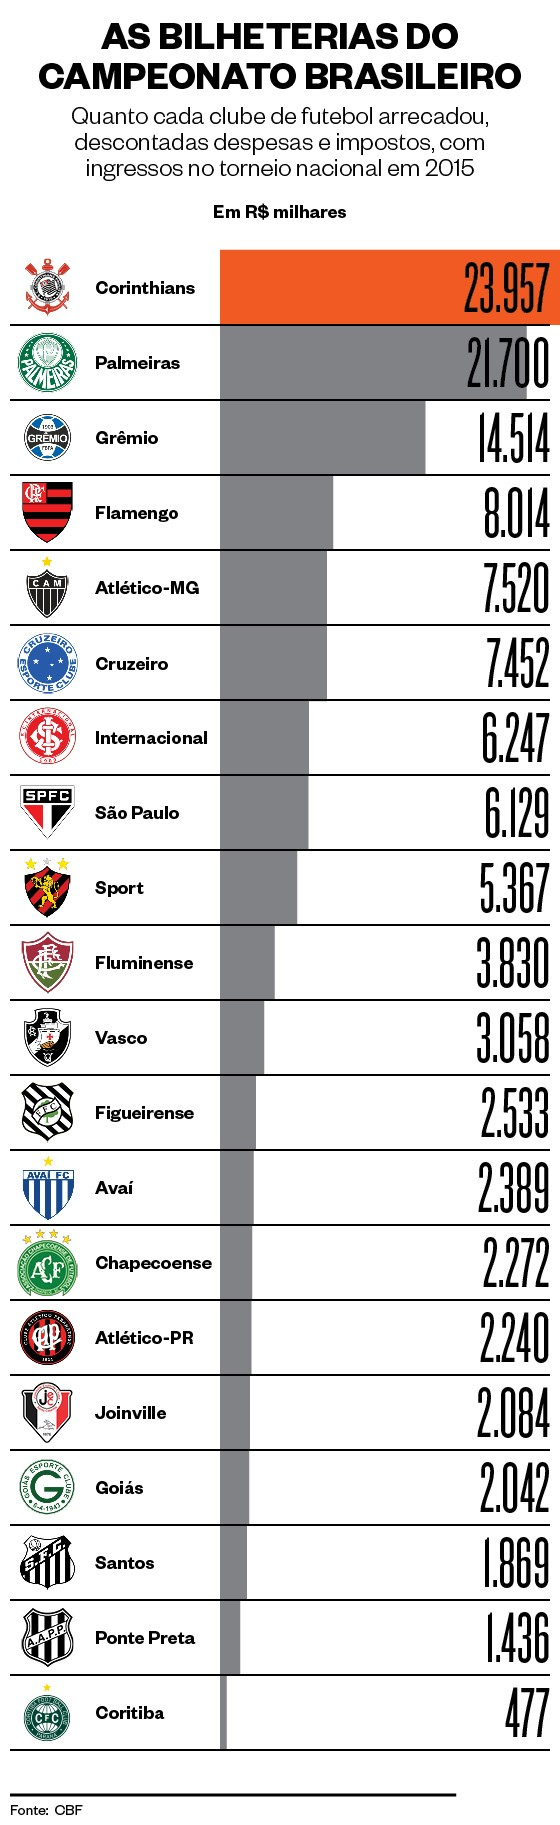 Bilheterias do Campeonato Brasileiro  (Foto: Época )